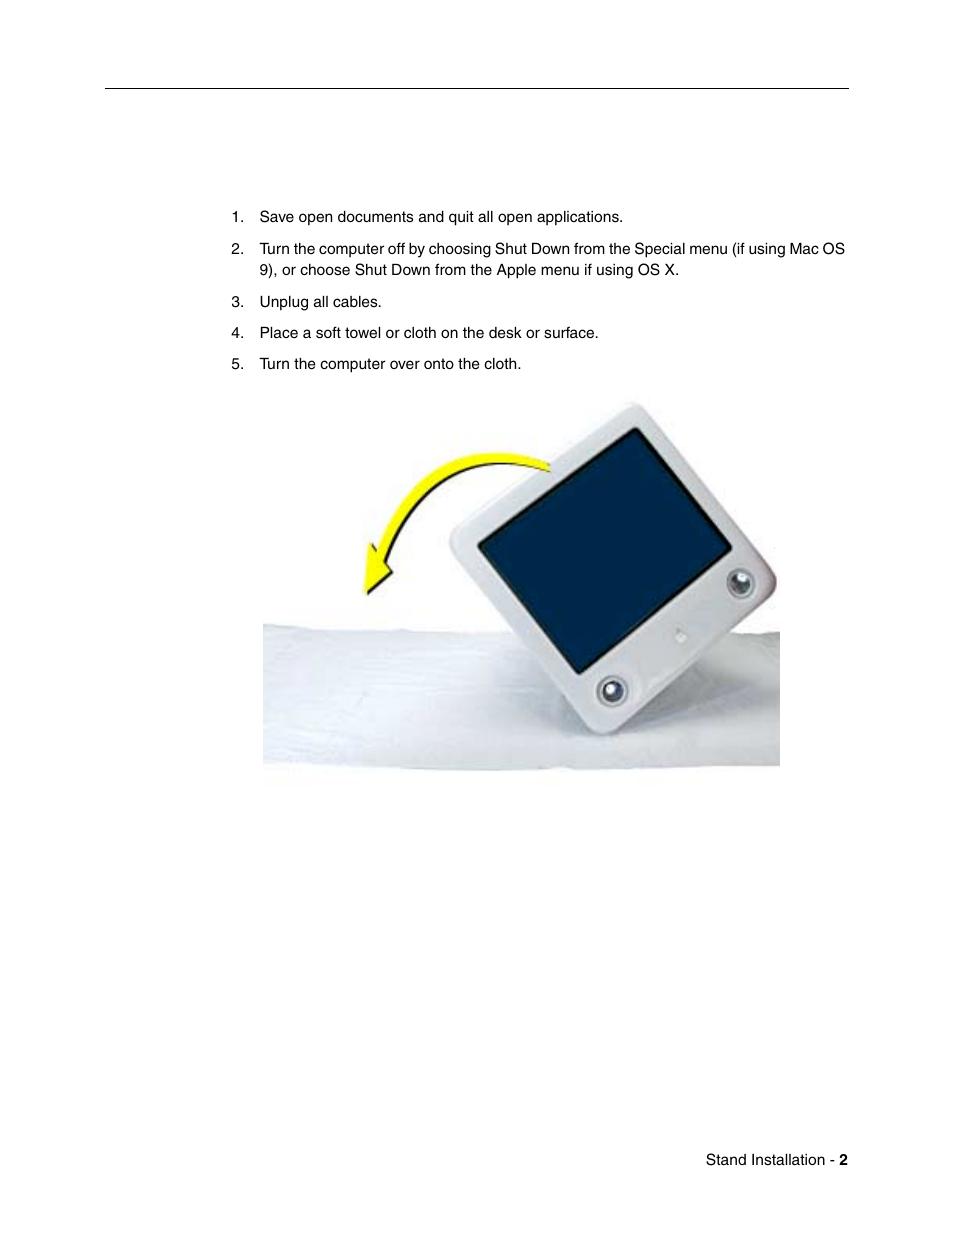 emac installation procedure to install the emac stand apple emac rh manualsdir com Apple iMac Apple Laptops